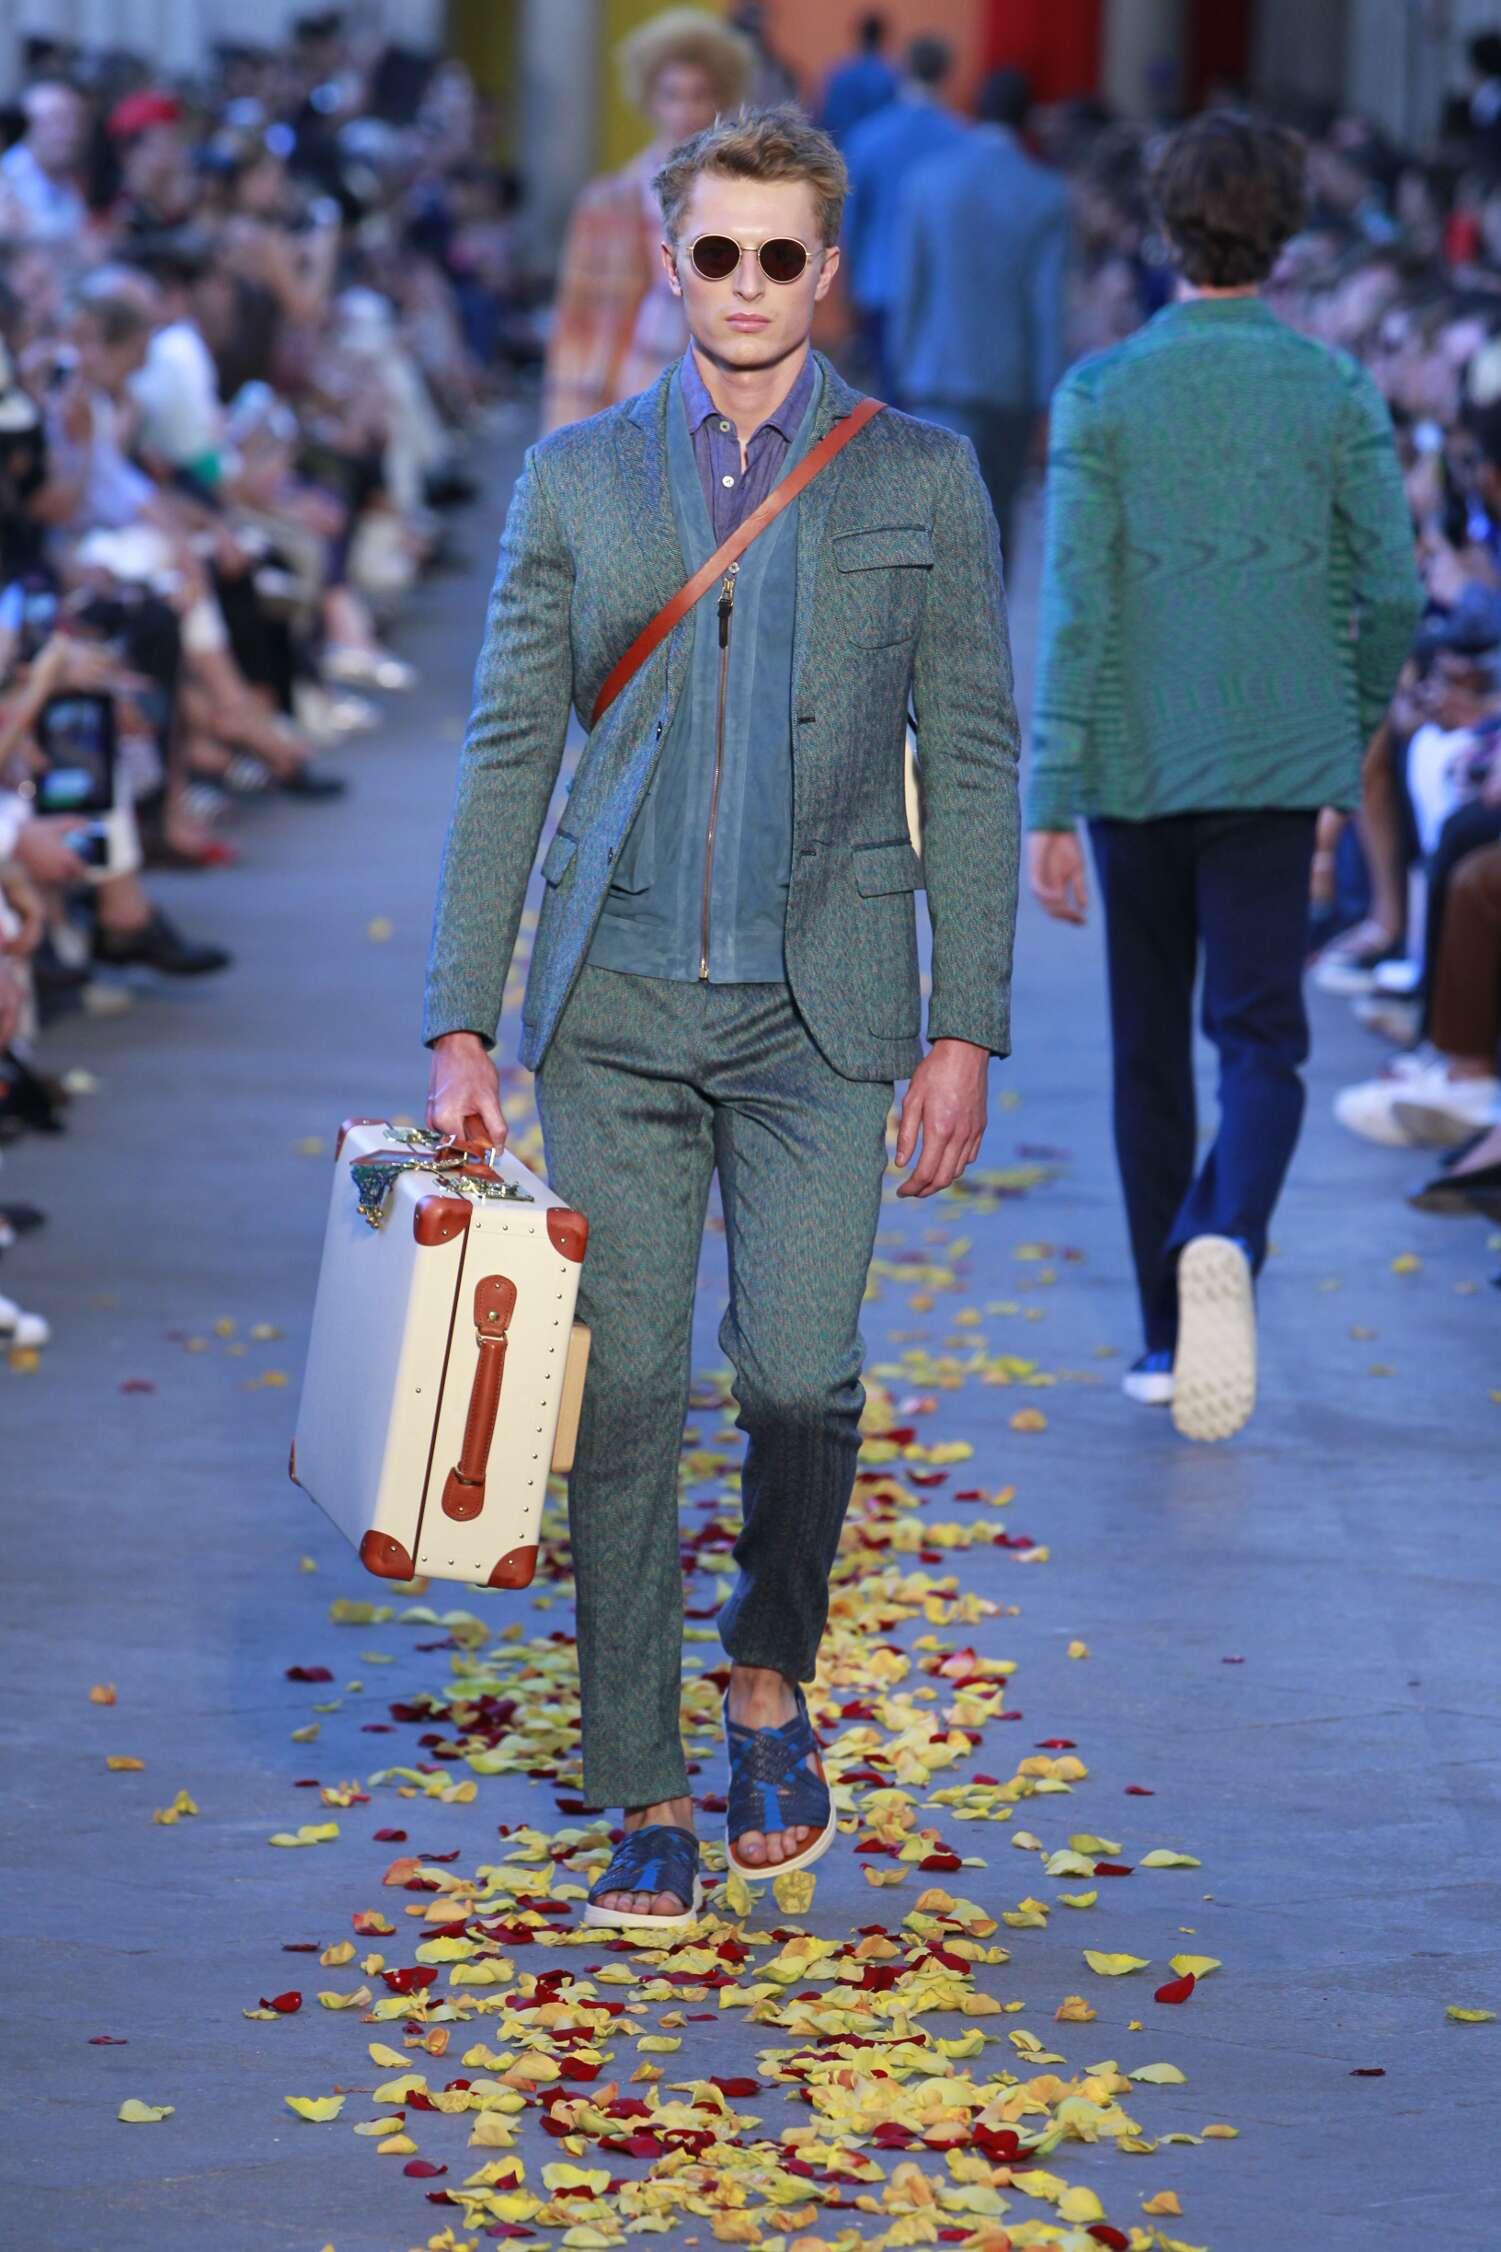 2016 Fashion Man Model Missoni Collection Catwalk